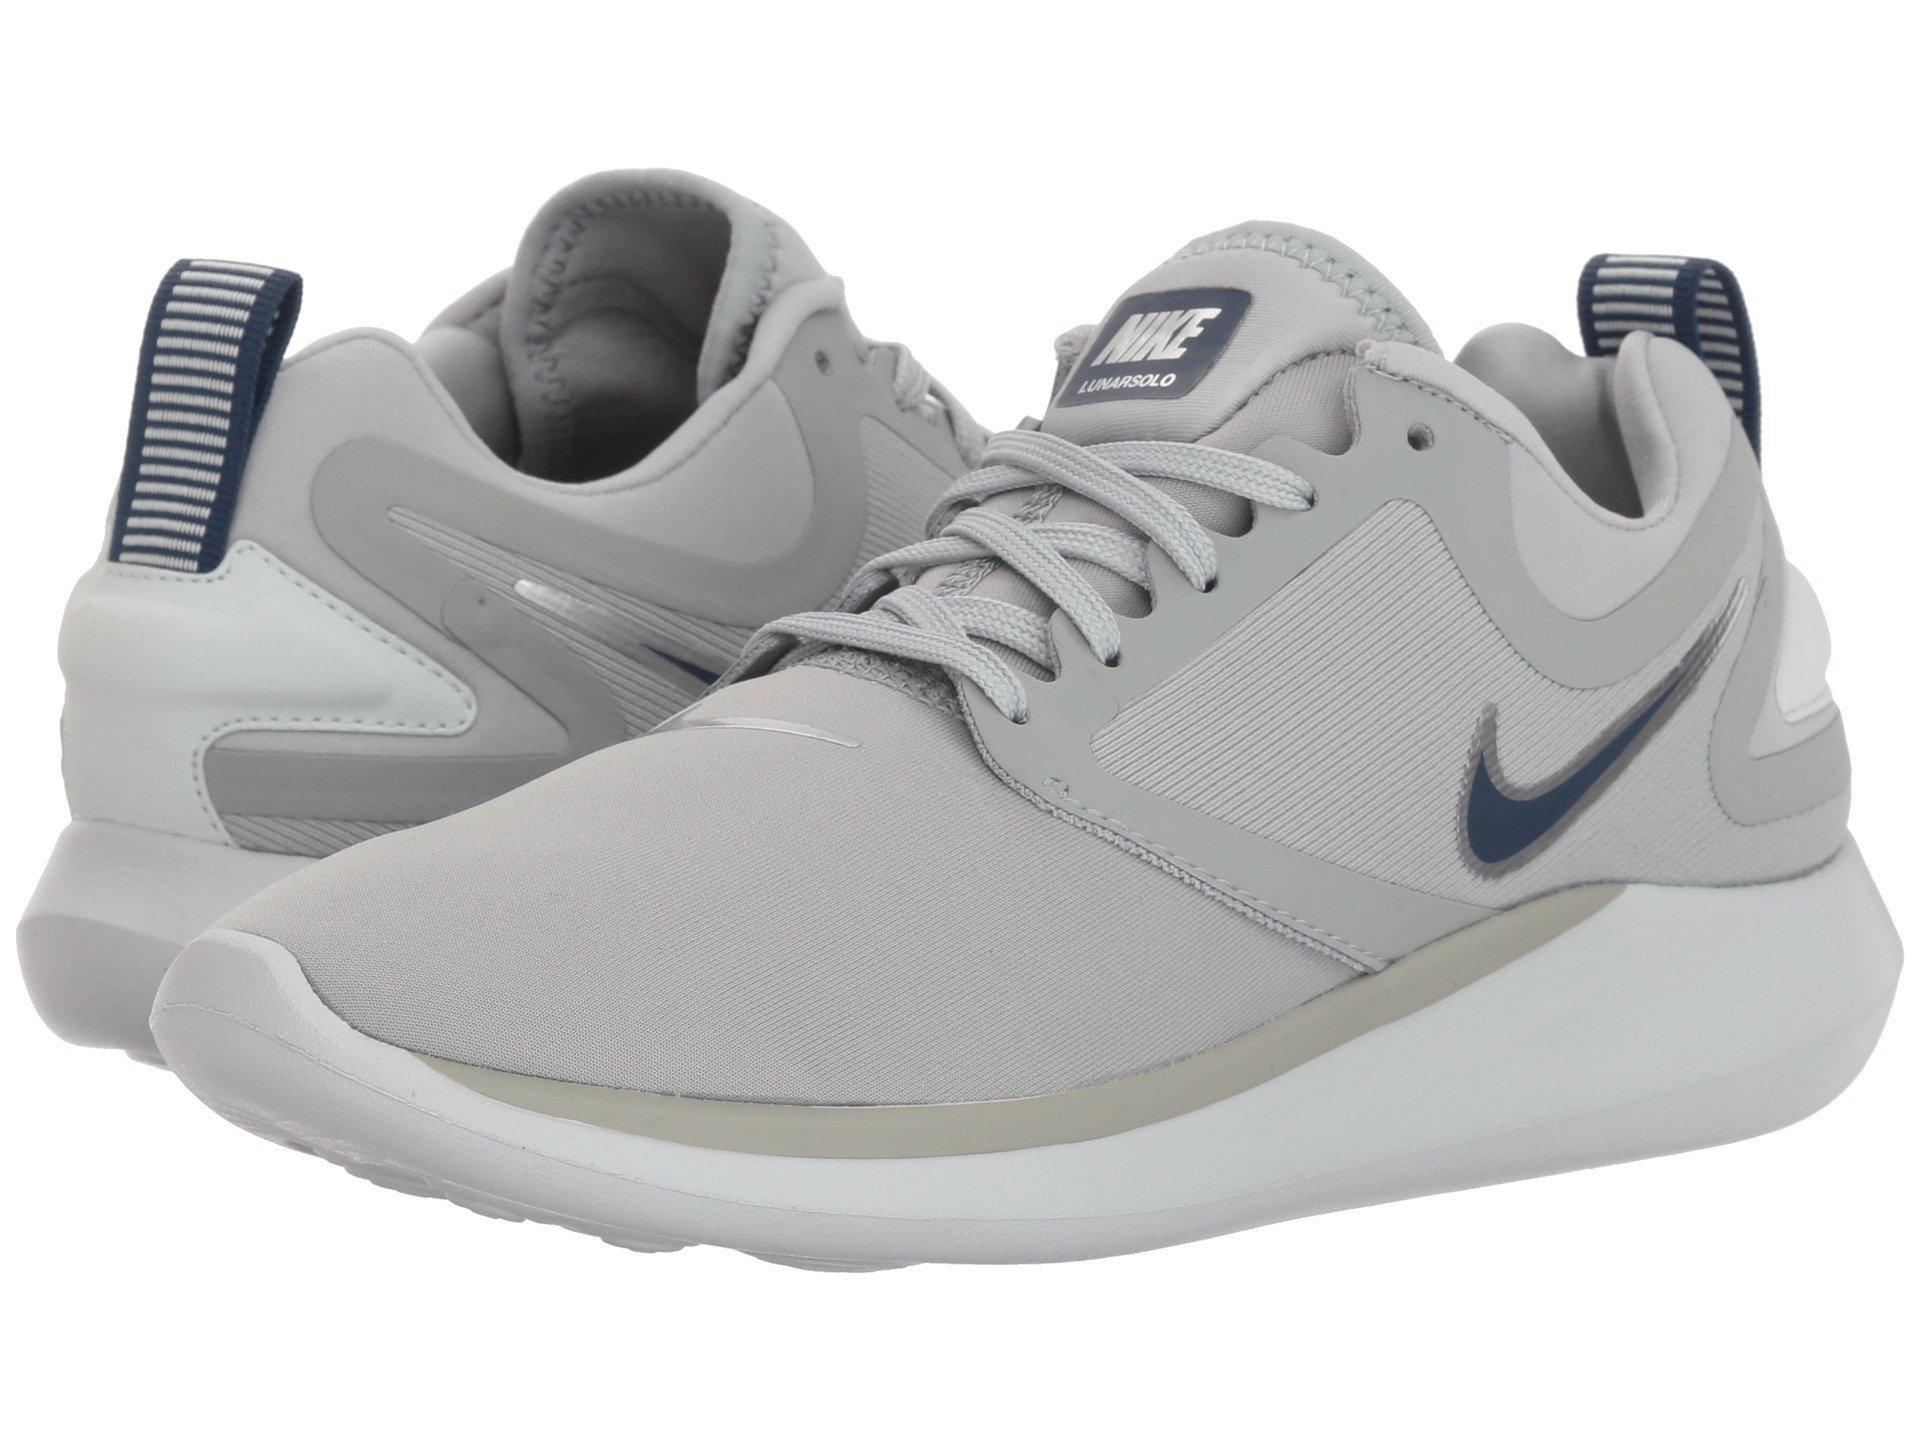 52b771c5b45 Galleon - NIKE Women s LunarSolo Lt Light Pumice Navy-Barely Grey Running  Shoes (9.5 B US)